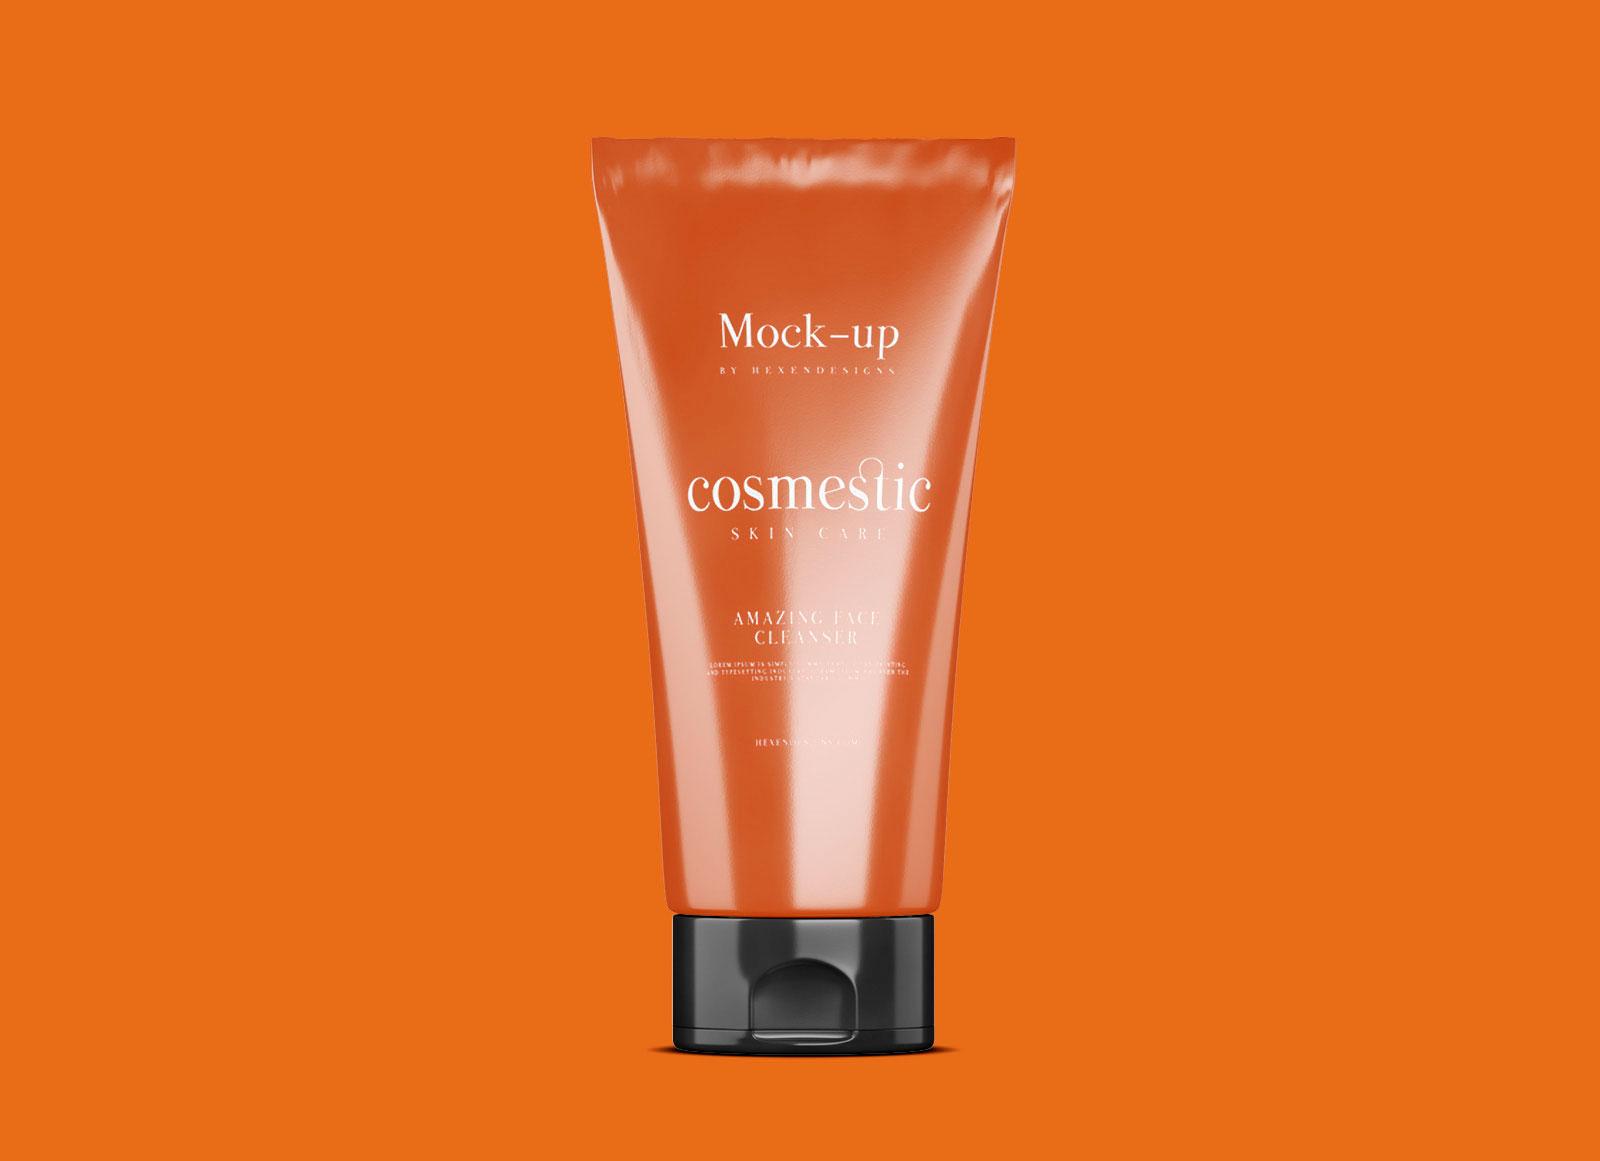 Free-Cosmetic-Cream-Tube-Mockup-PSD-2